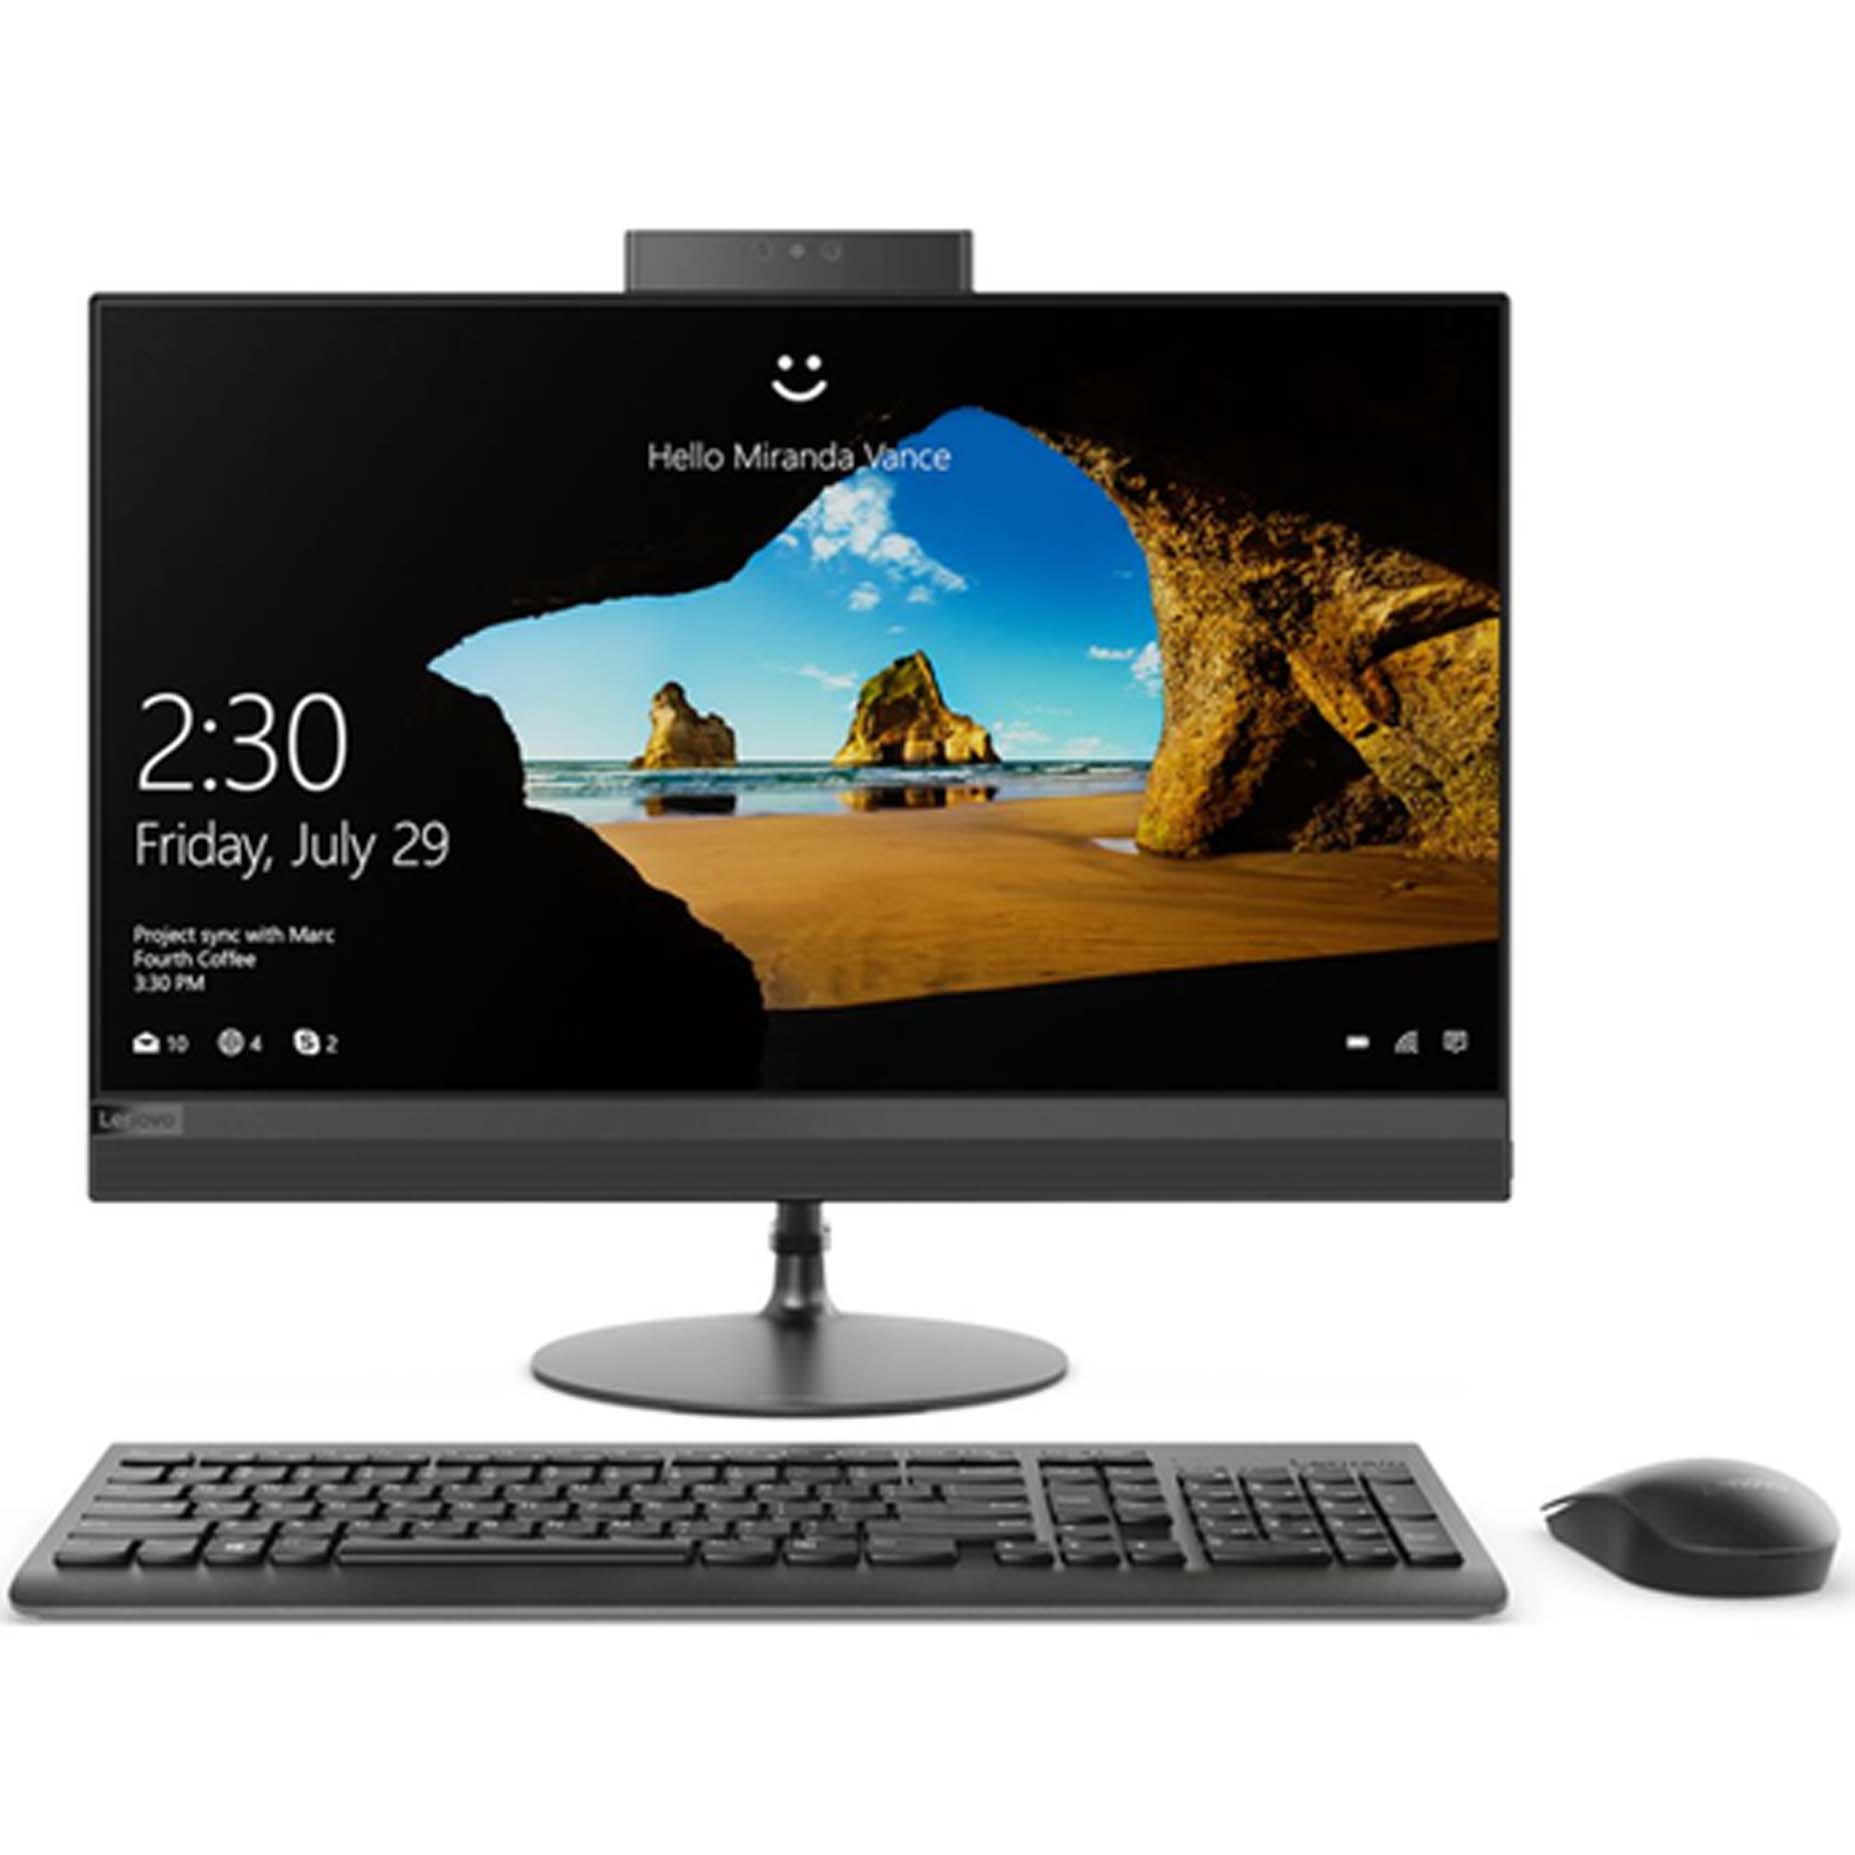 Harga Lenovo IdeaCentre 520-24ICB 0YID All in One i7-8700T 8GB 2TB ATI Radeon 530 2GB Win10 23.8 Inch Black